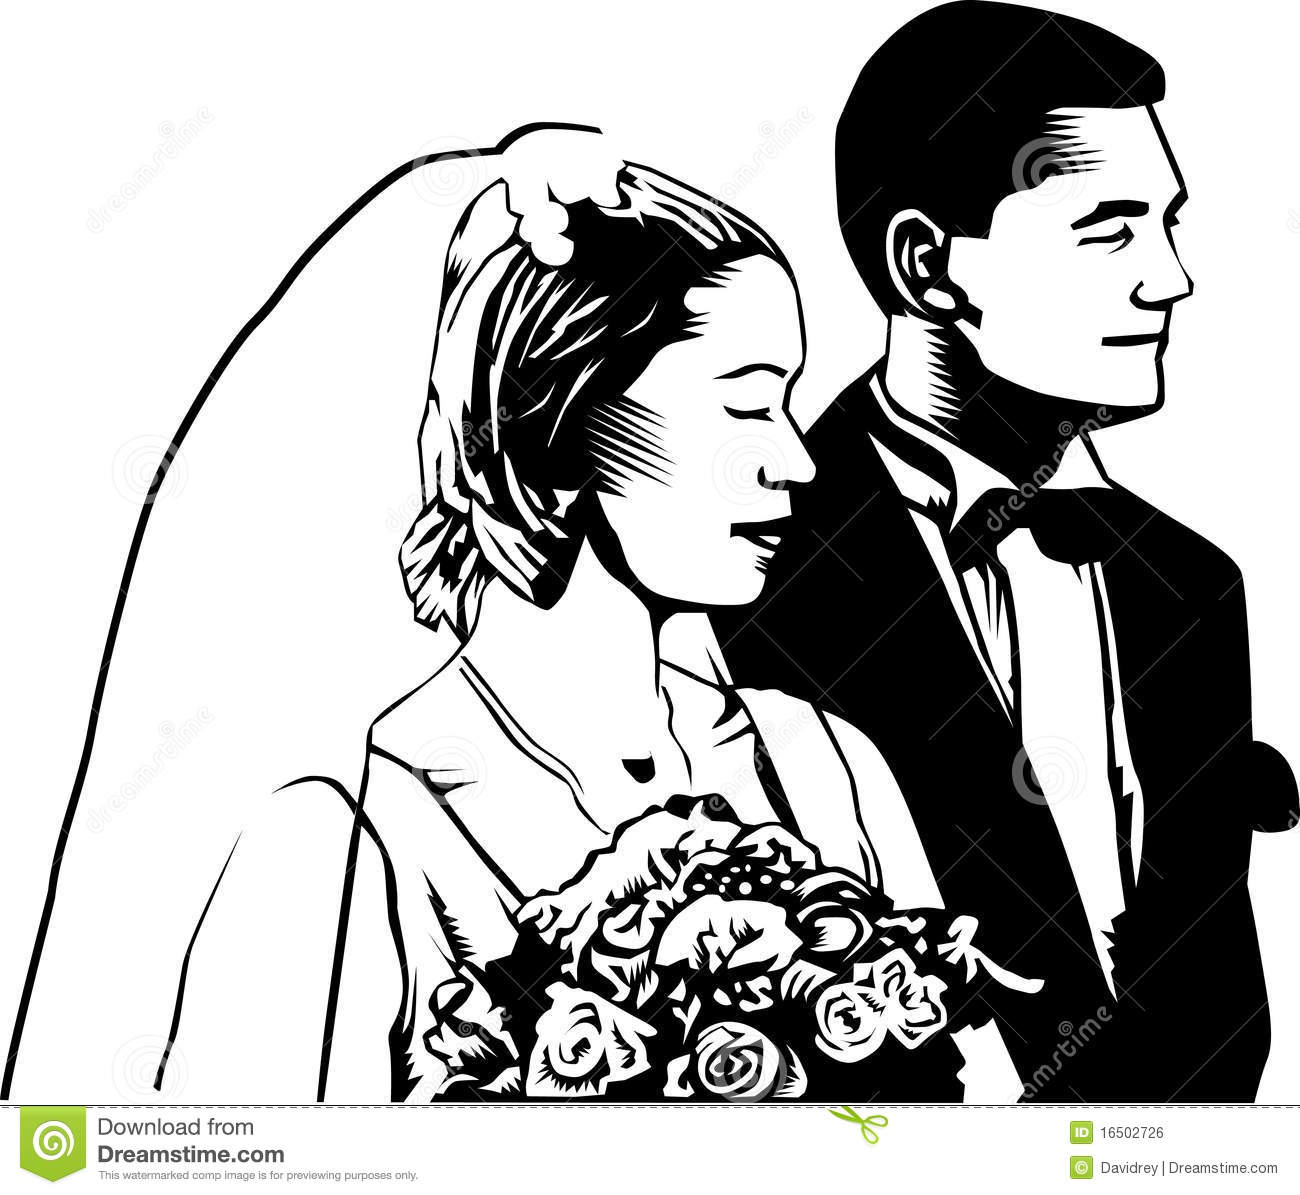 Braut und brutigam clipart jpg freeuse stock Braut und bräutigam clipart - ClipartFest jpg freeuse stock